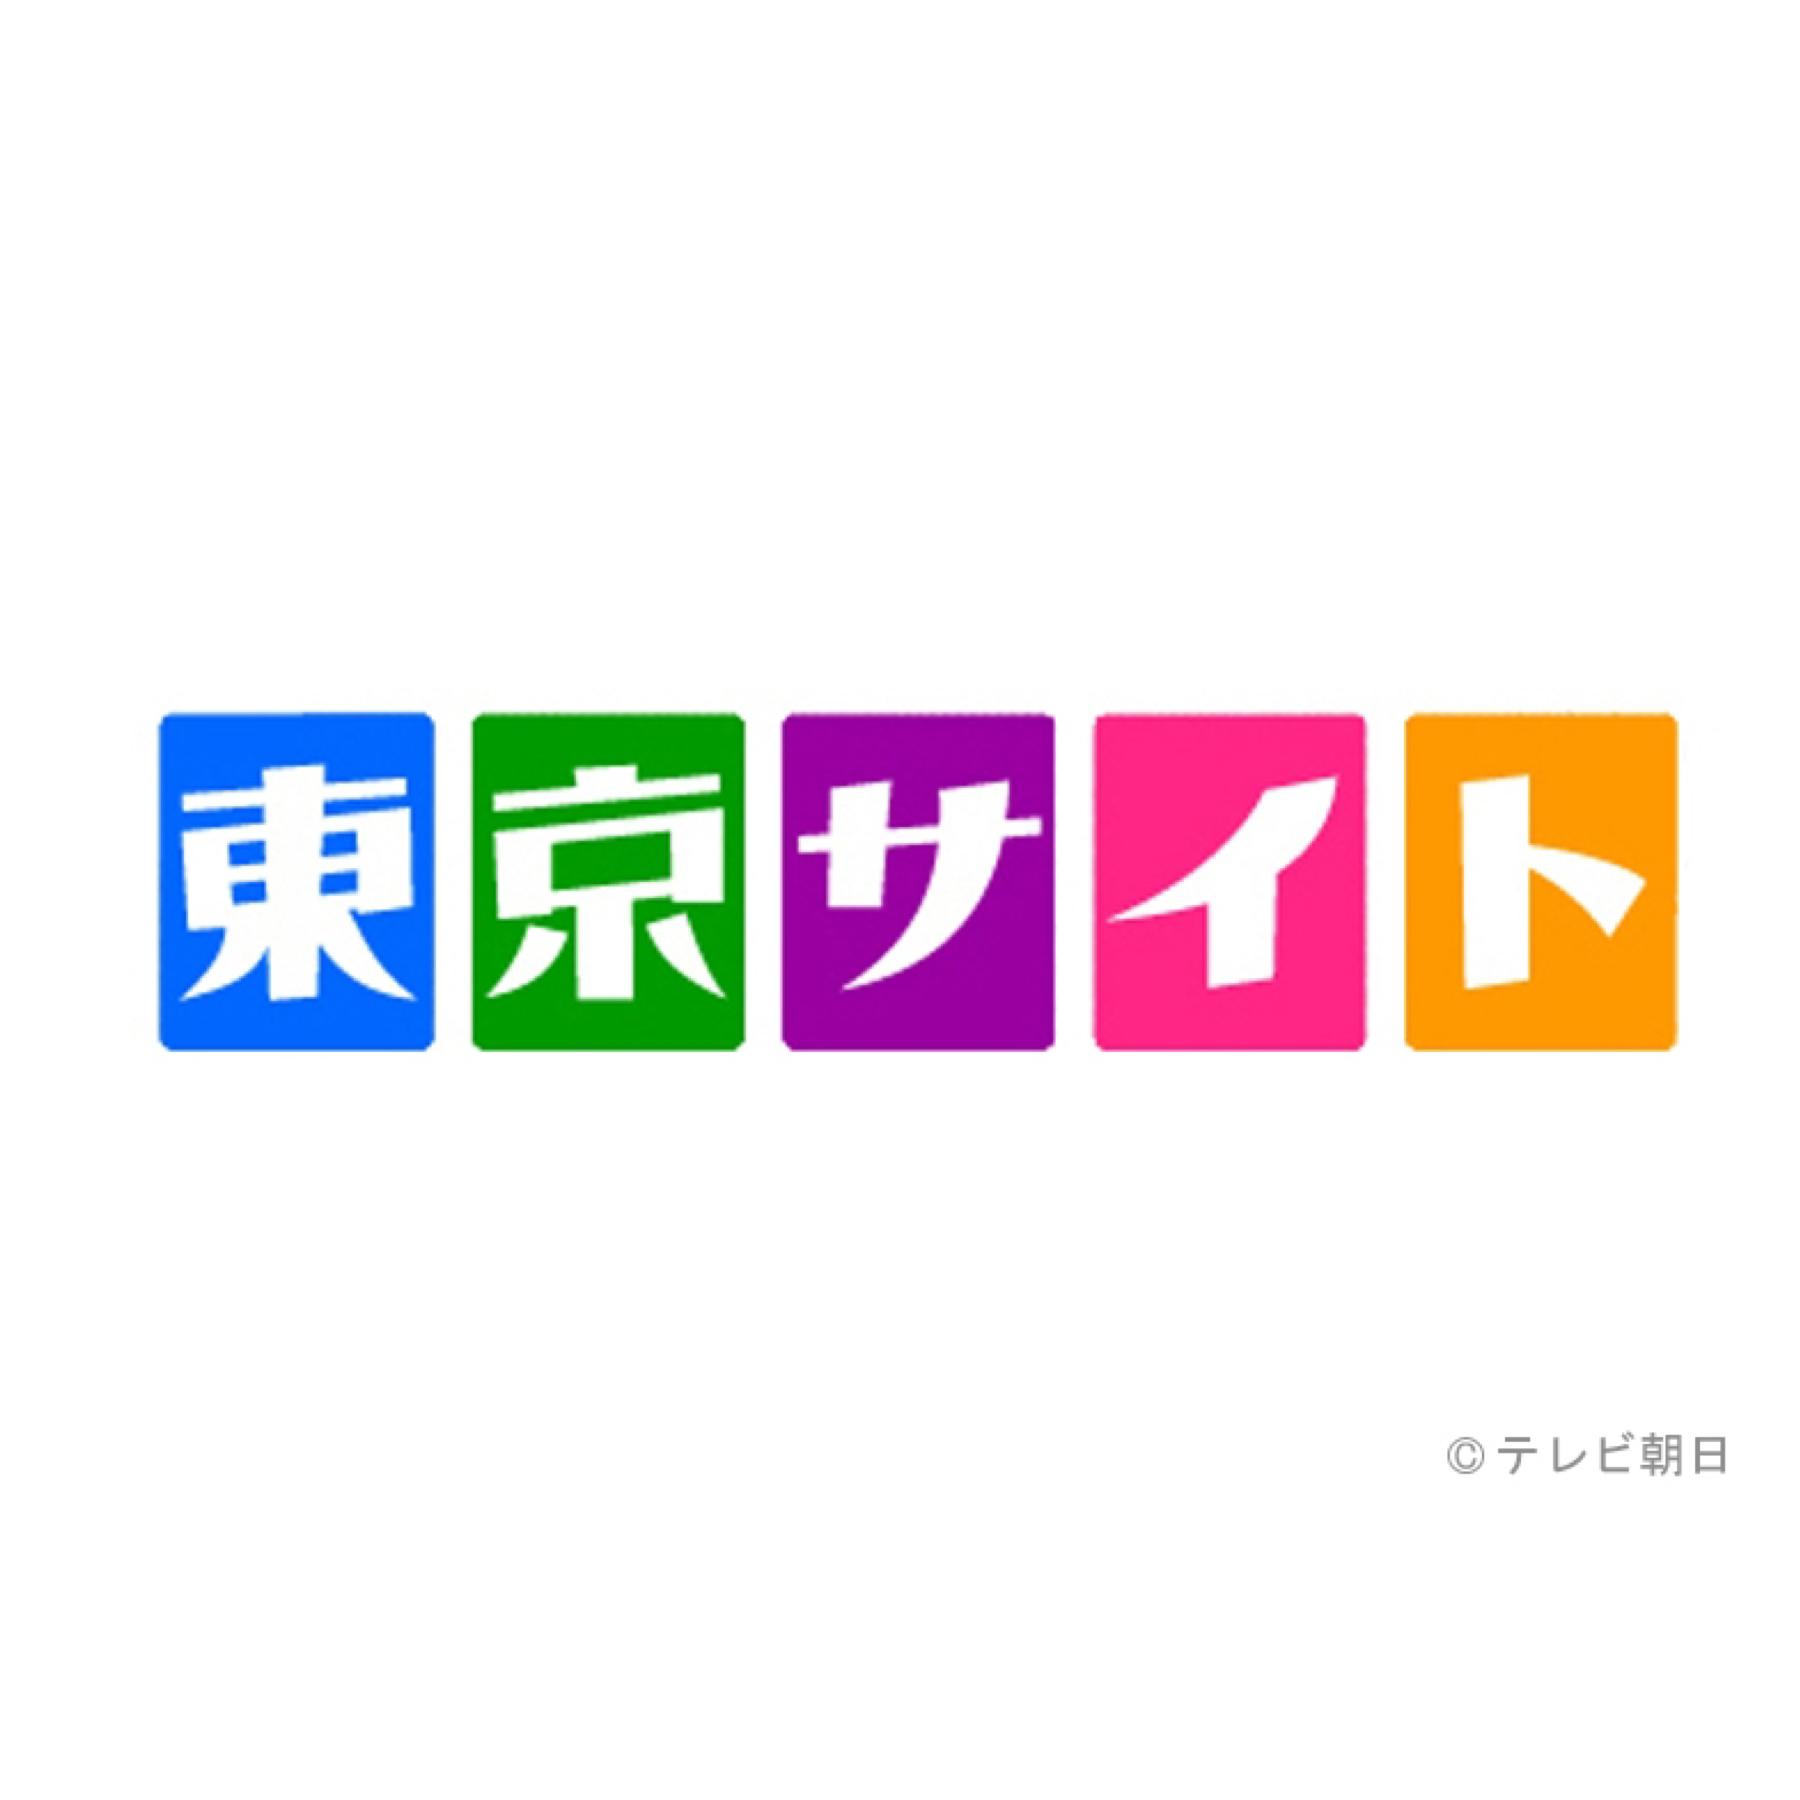 [TV放送のお知らせ]